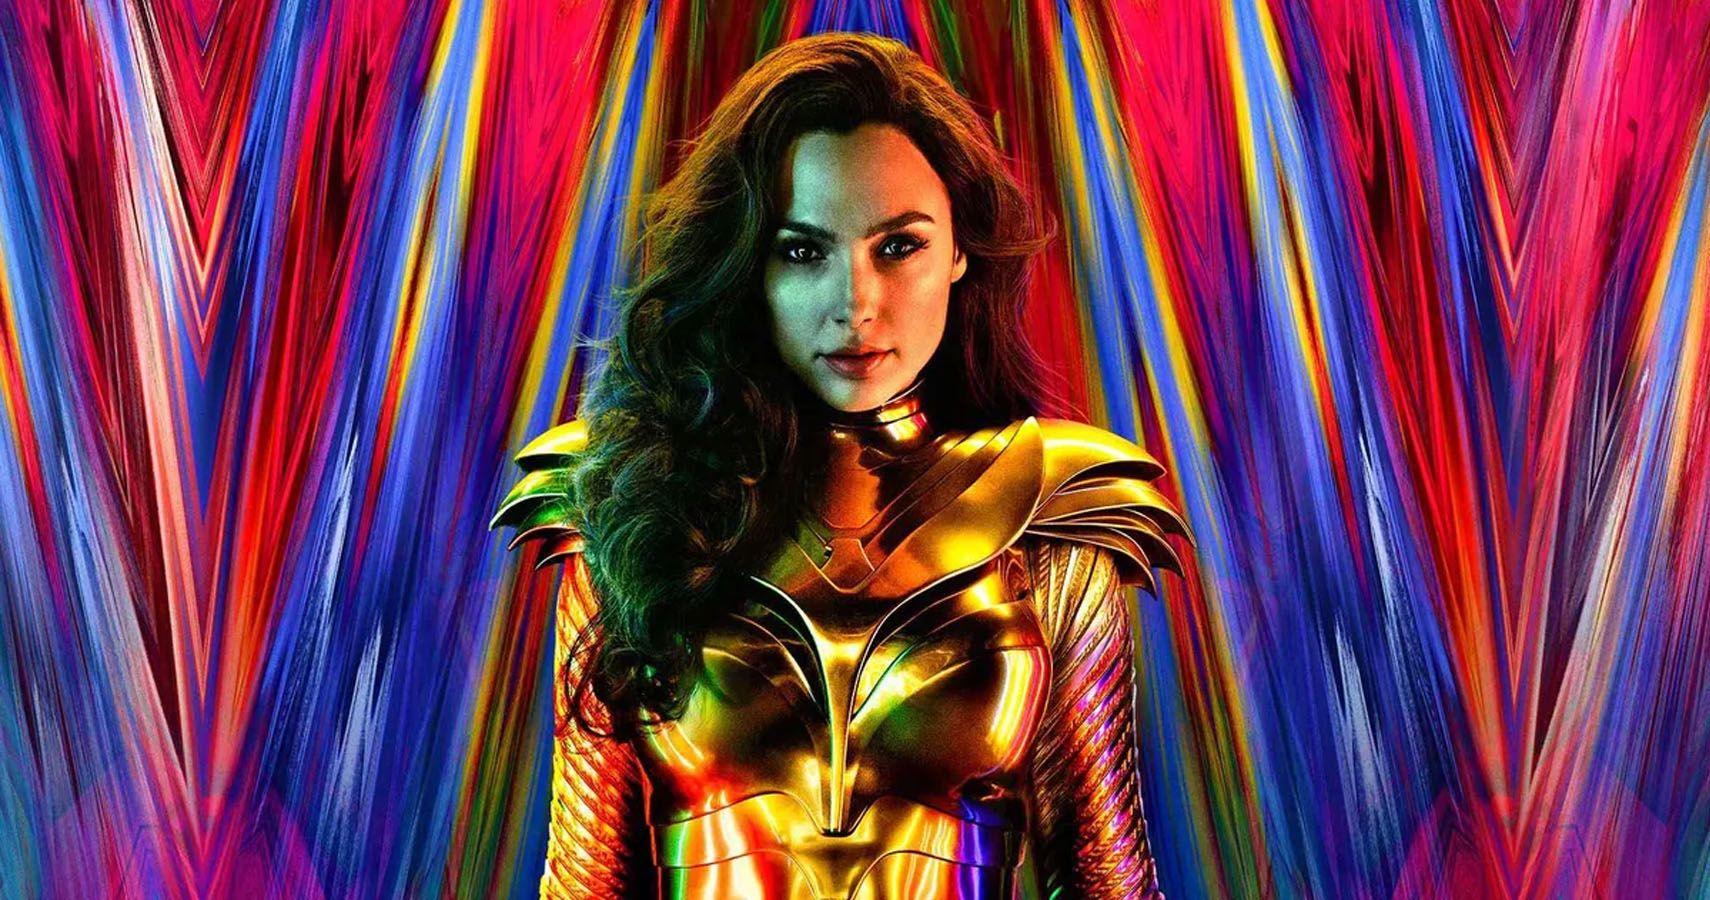 Wonder Women 1984: Everything We Know So Far | ScreenRant